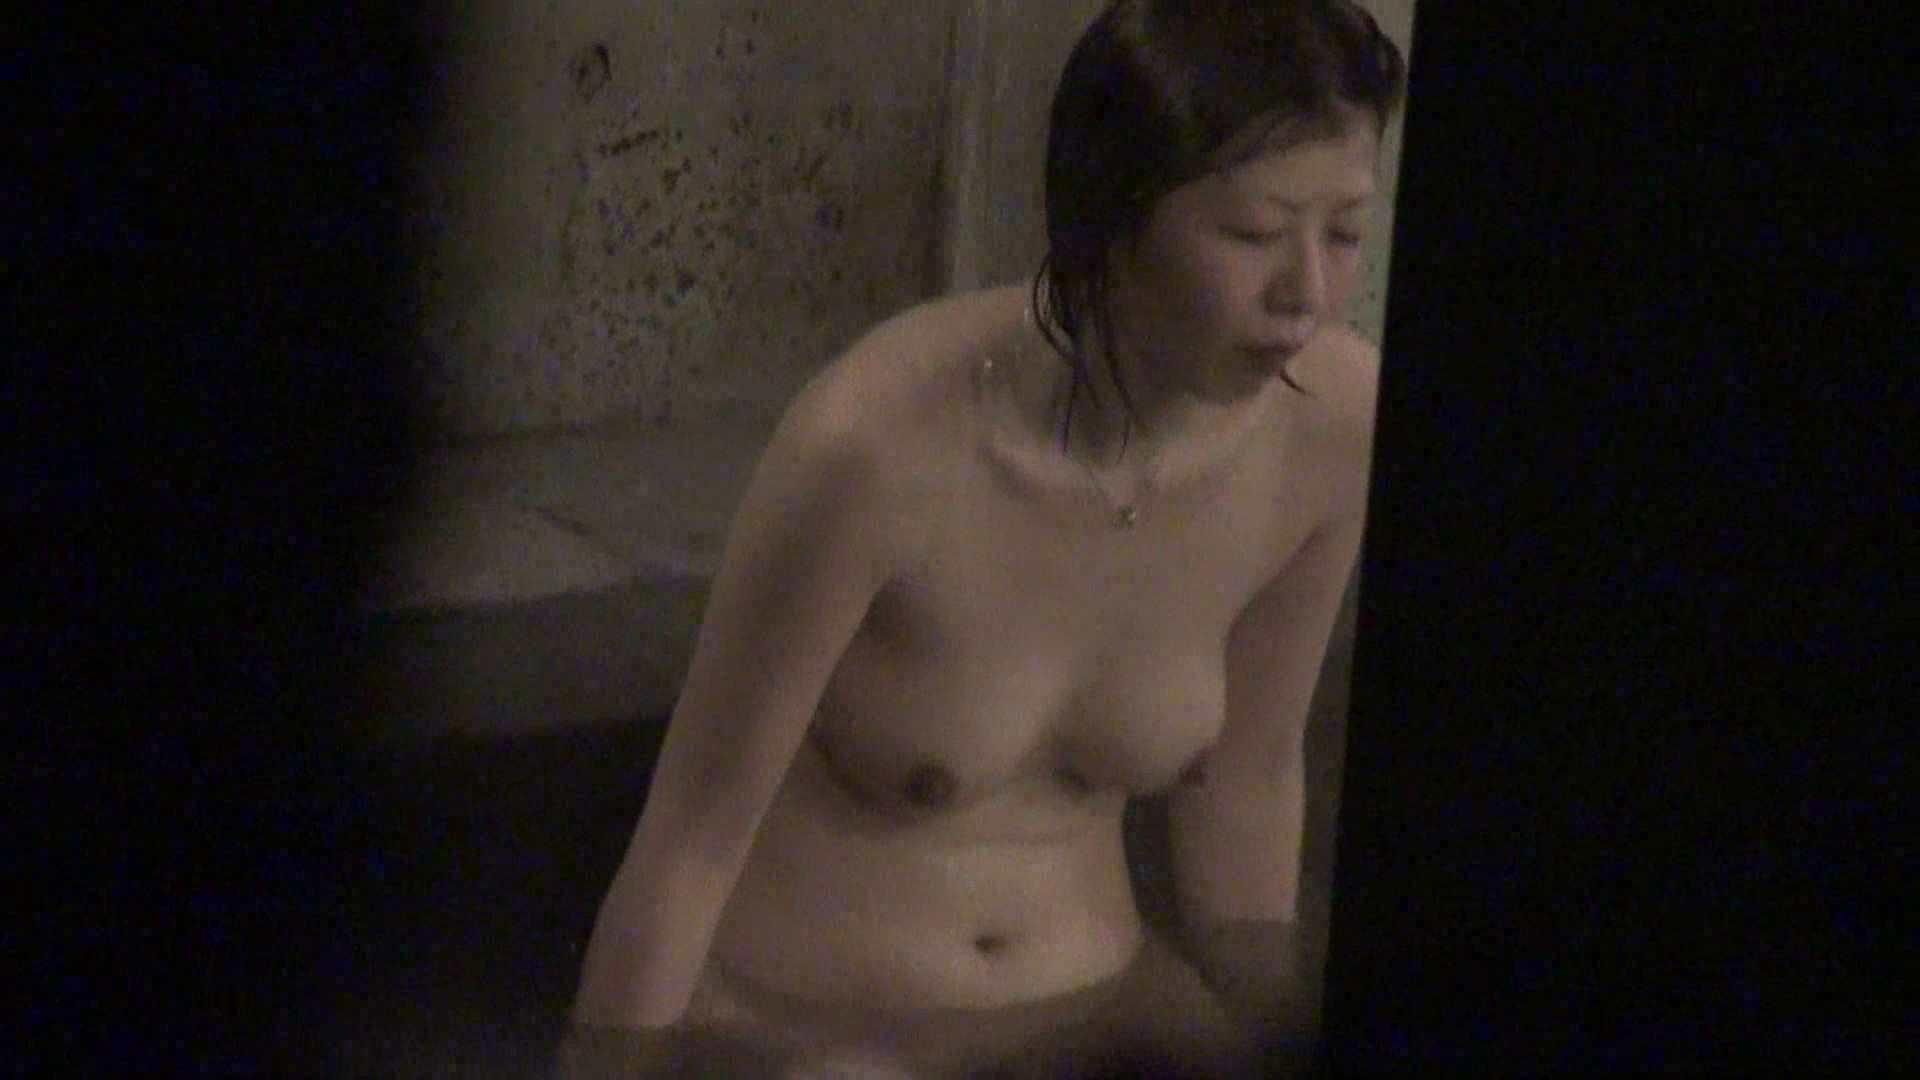 Aquaな露天風呂Vol.431 エロいOL えろ無修正画像 109枚